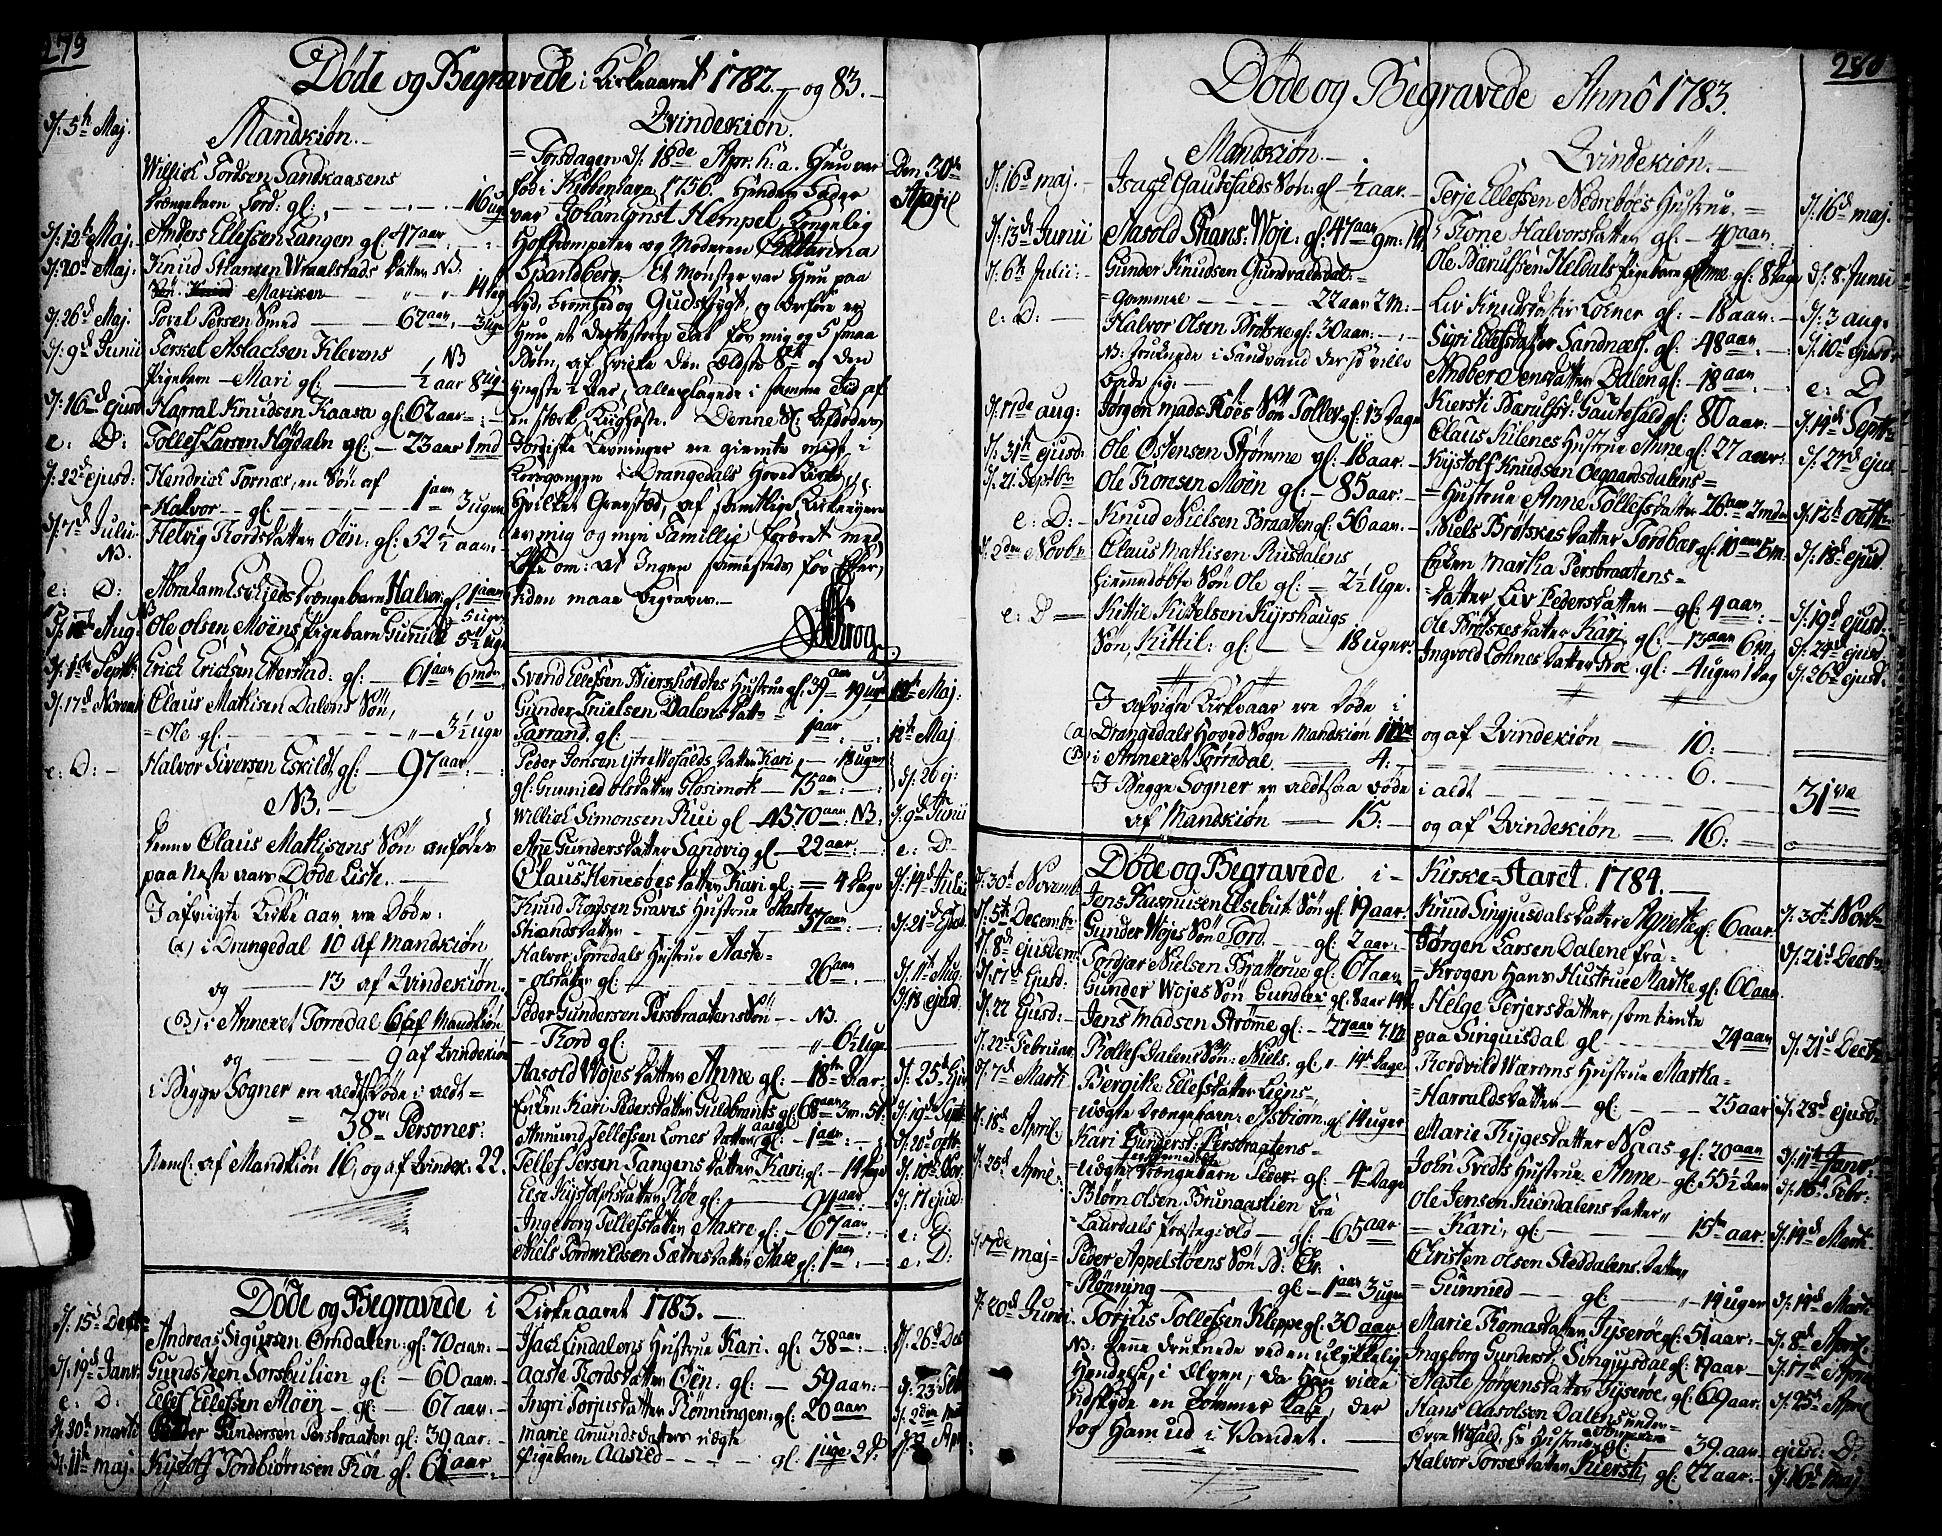 SAKO, Drangedal kirkebøker, F/Fa/L0003: Ministerialbok nr. 3, 1768-1814, s. 279-280